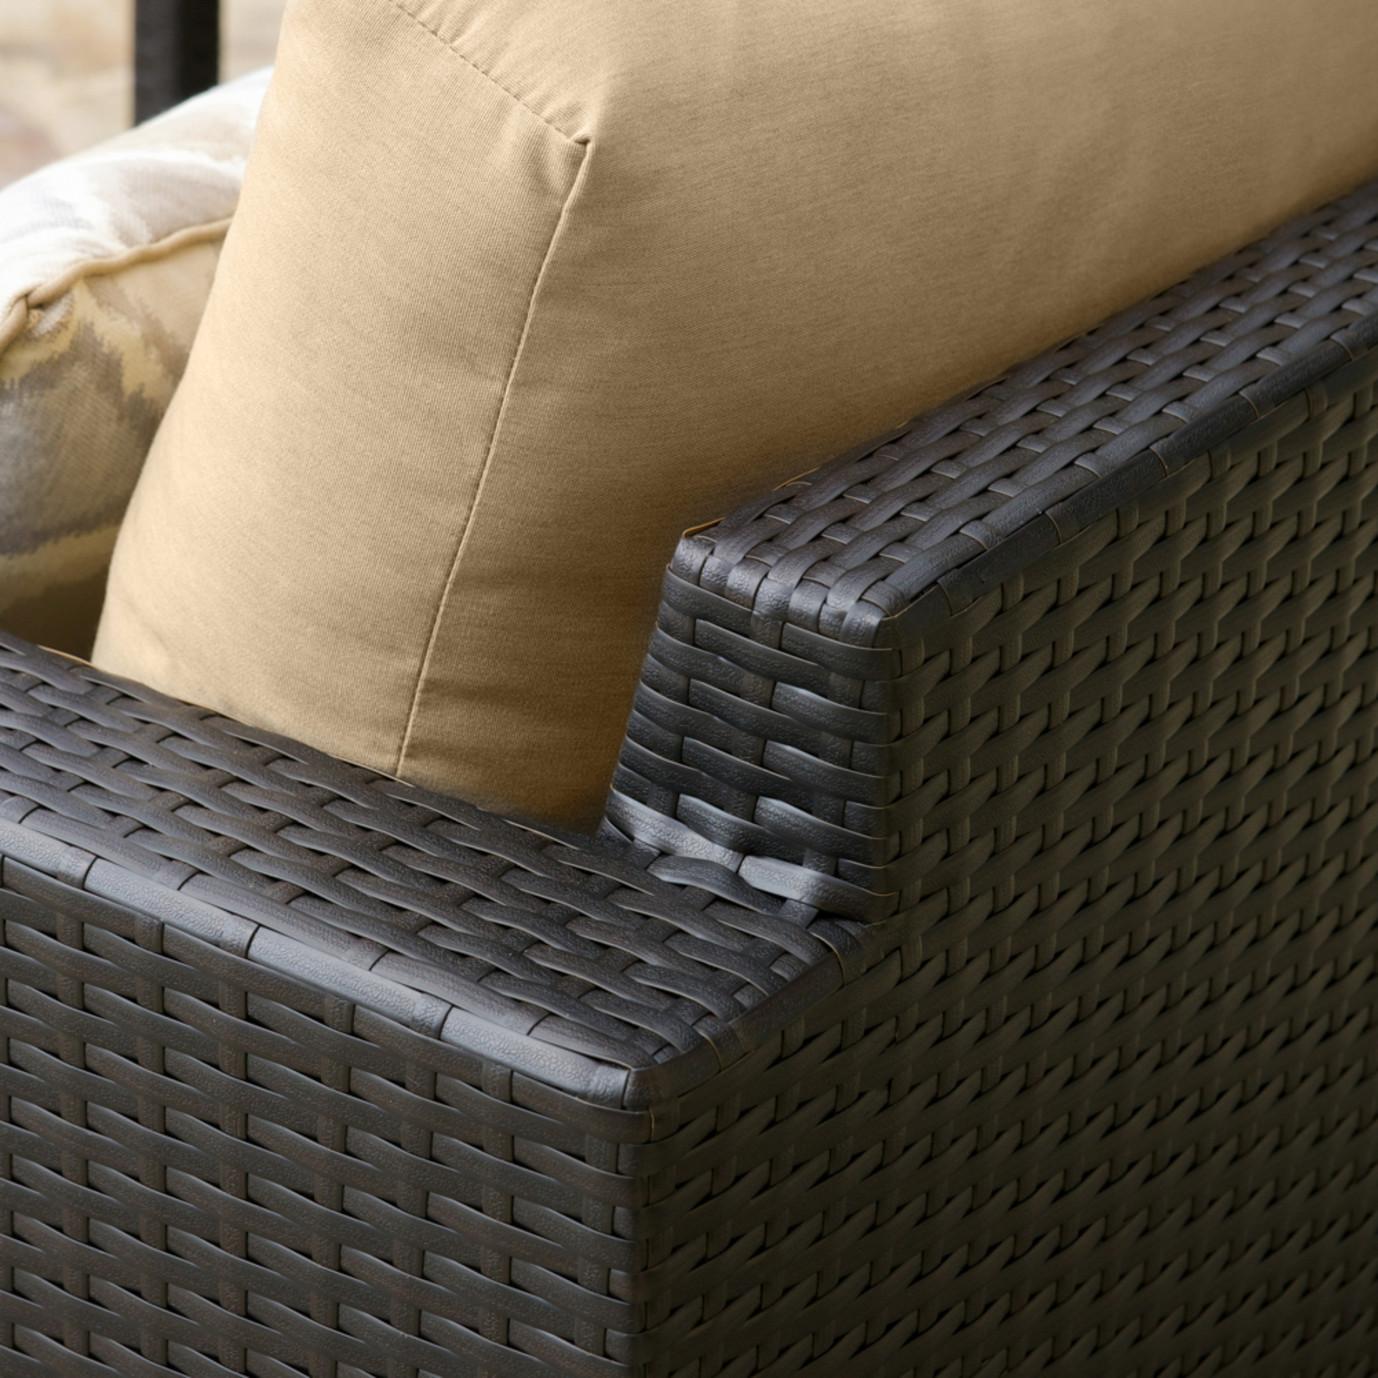 ... Portofino™ Comfort 7pc Deep Seating Set - Heather Beige ... - Portofino Comfort 7pc Set - Heather BeigeRST Brands